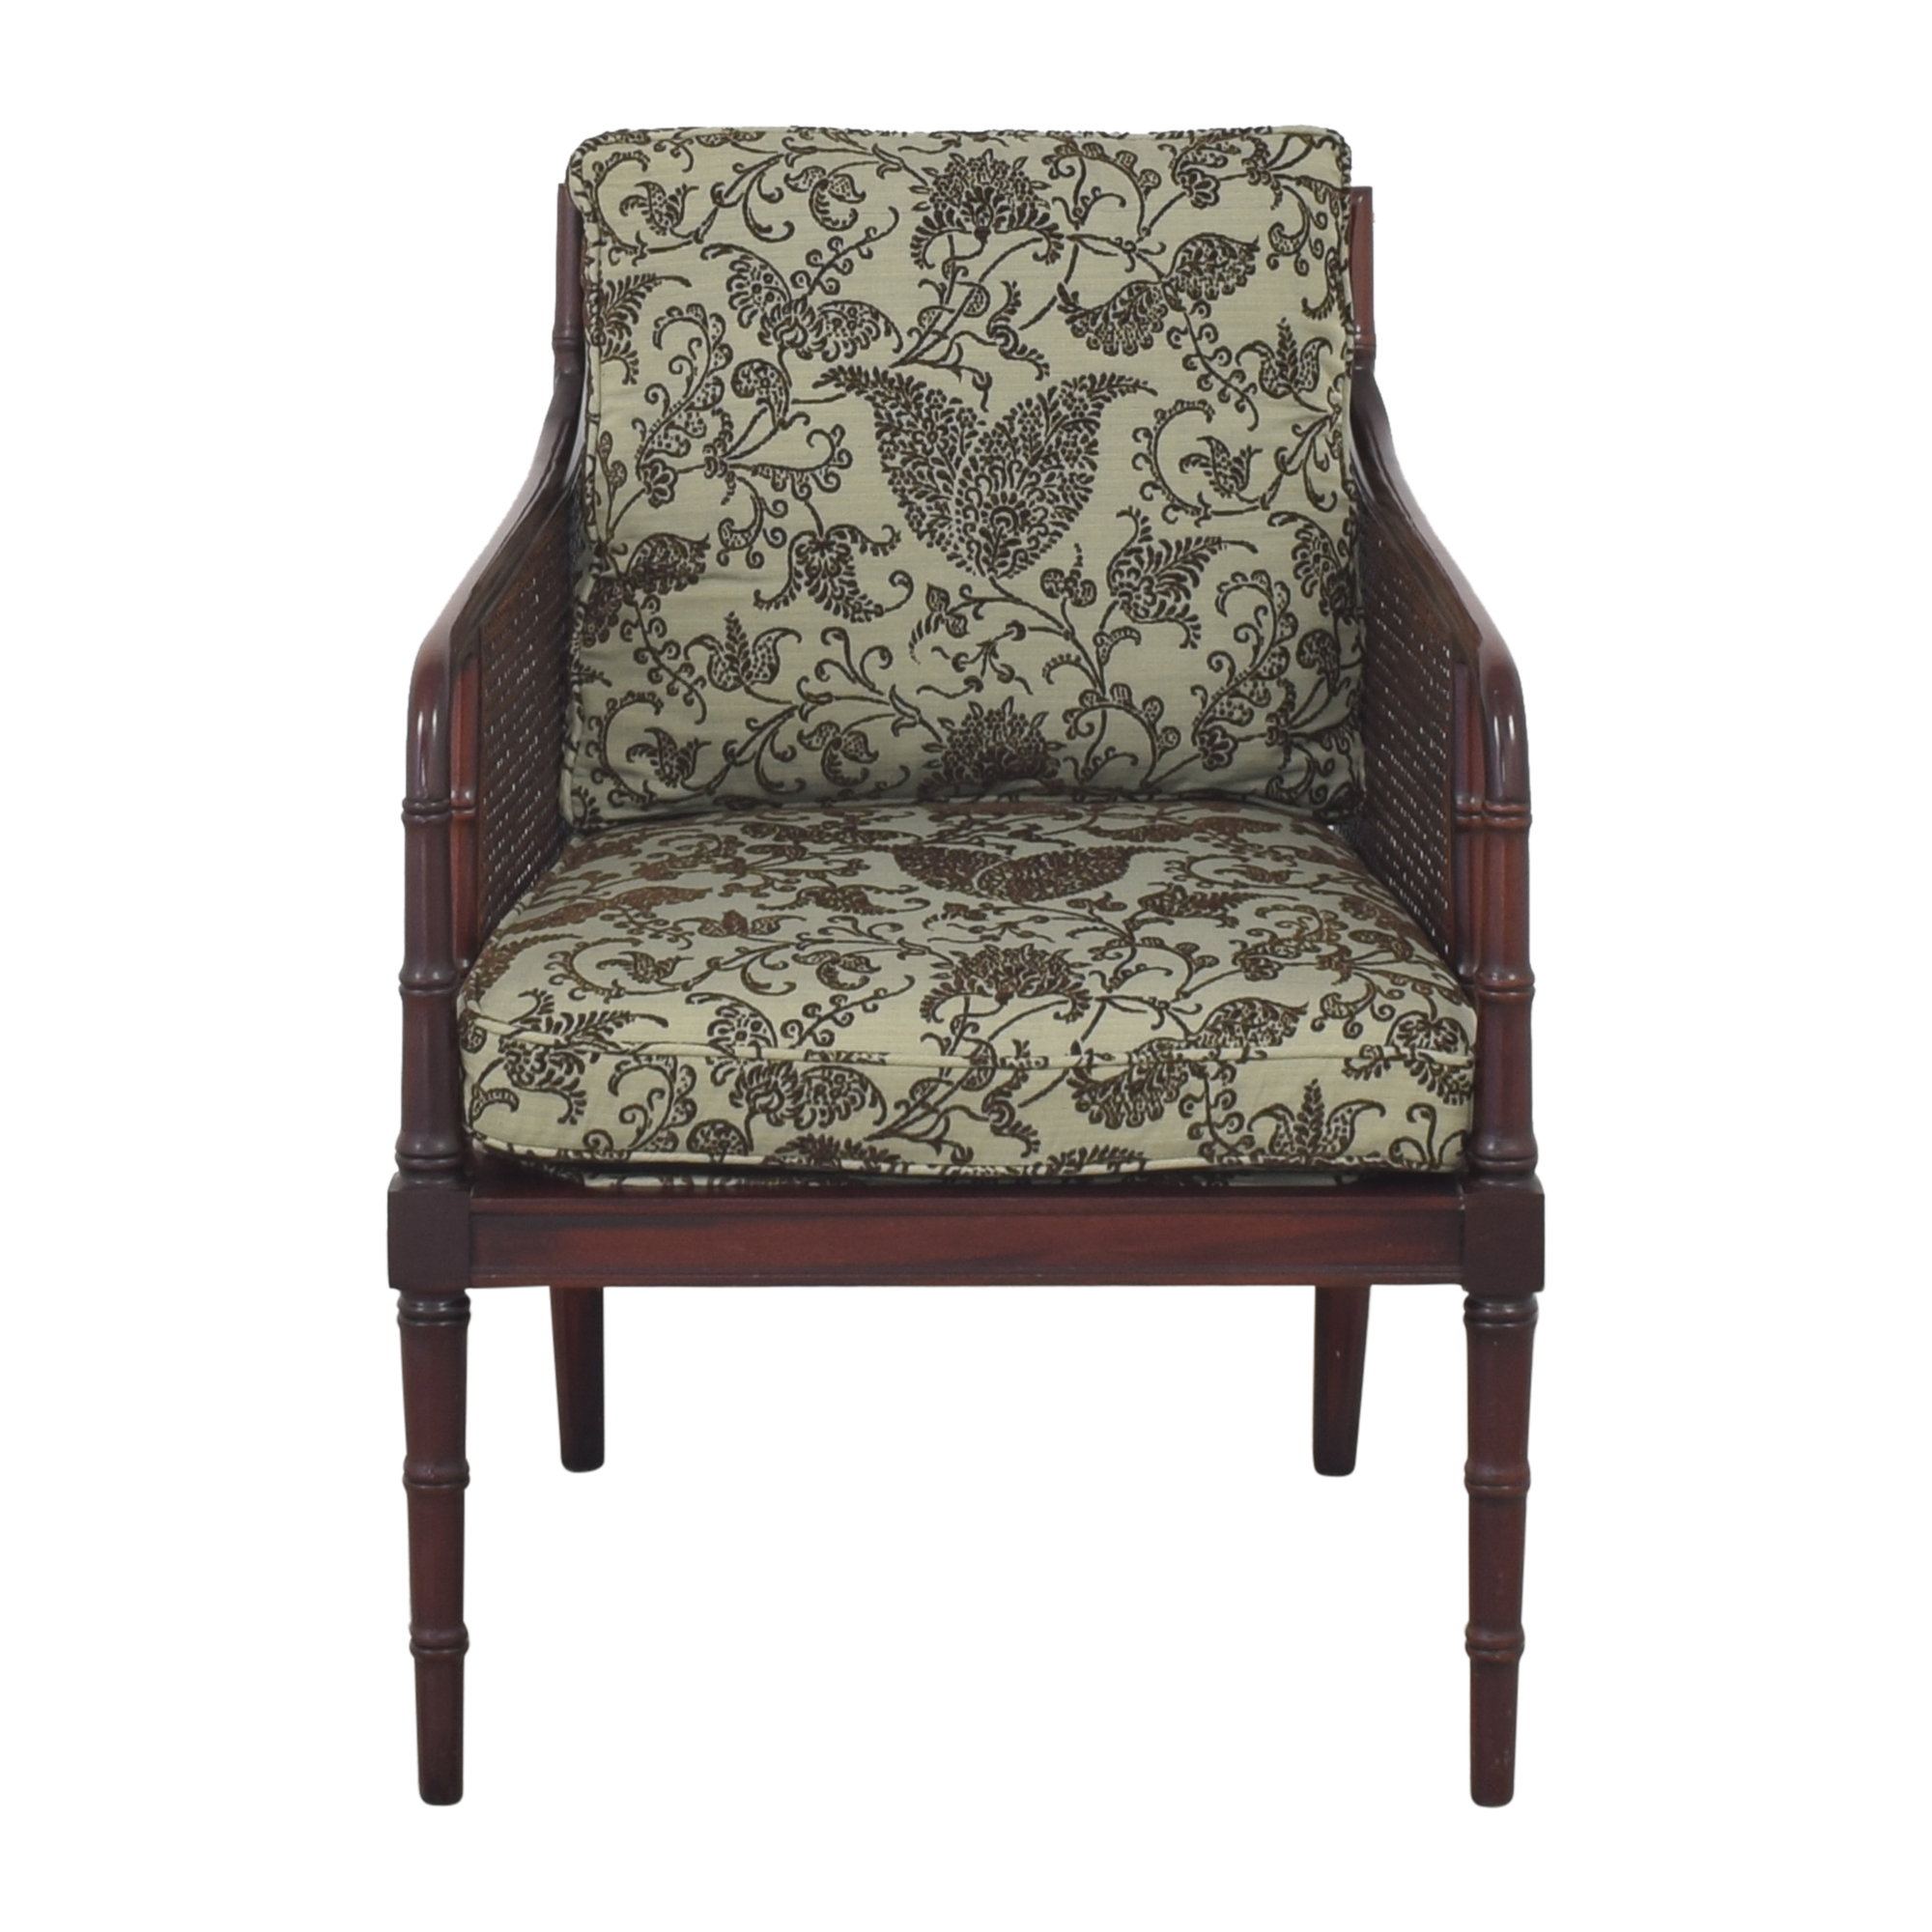 Sheraton Sheraton Baldwin Occasional Chair for sale